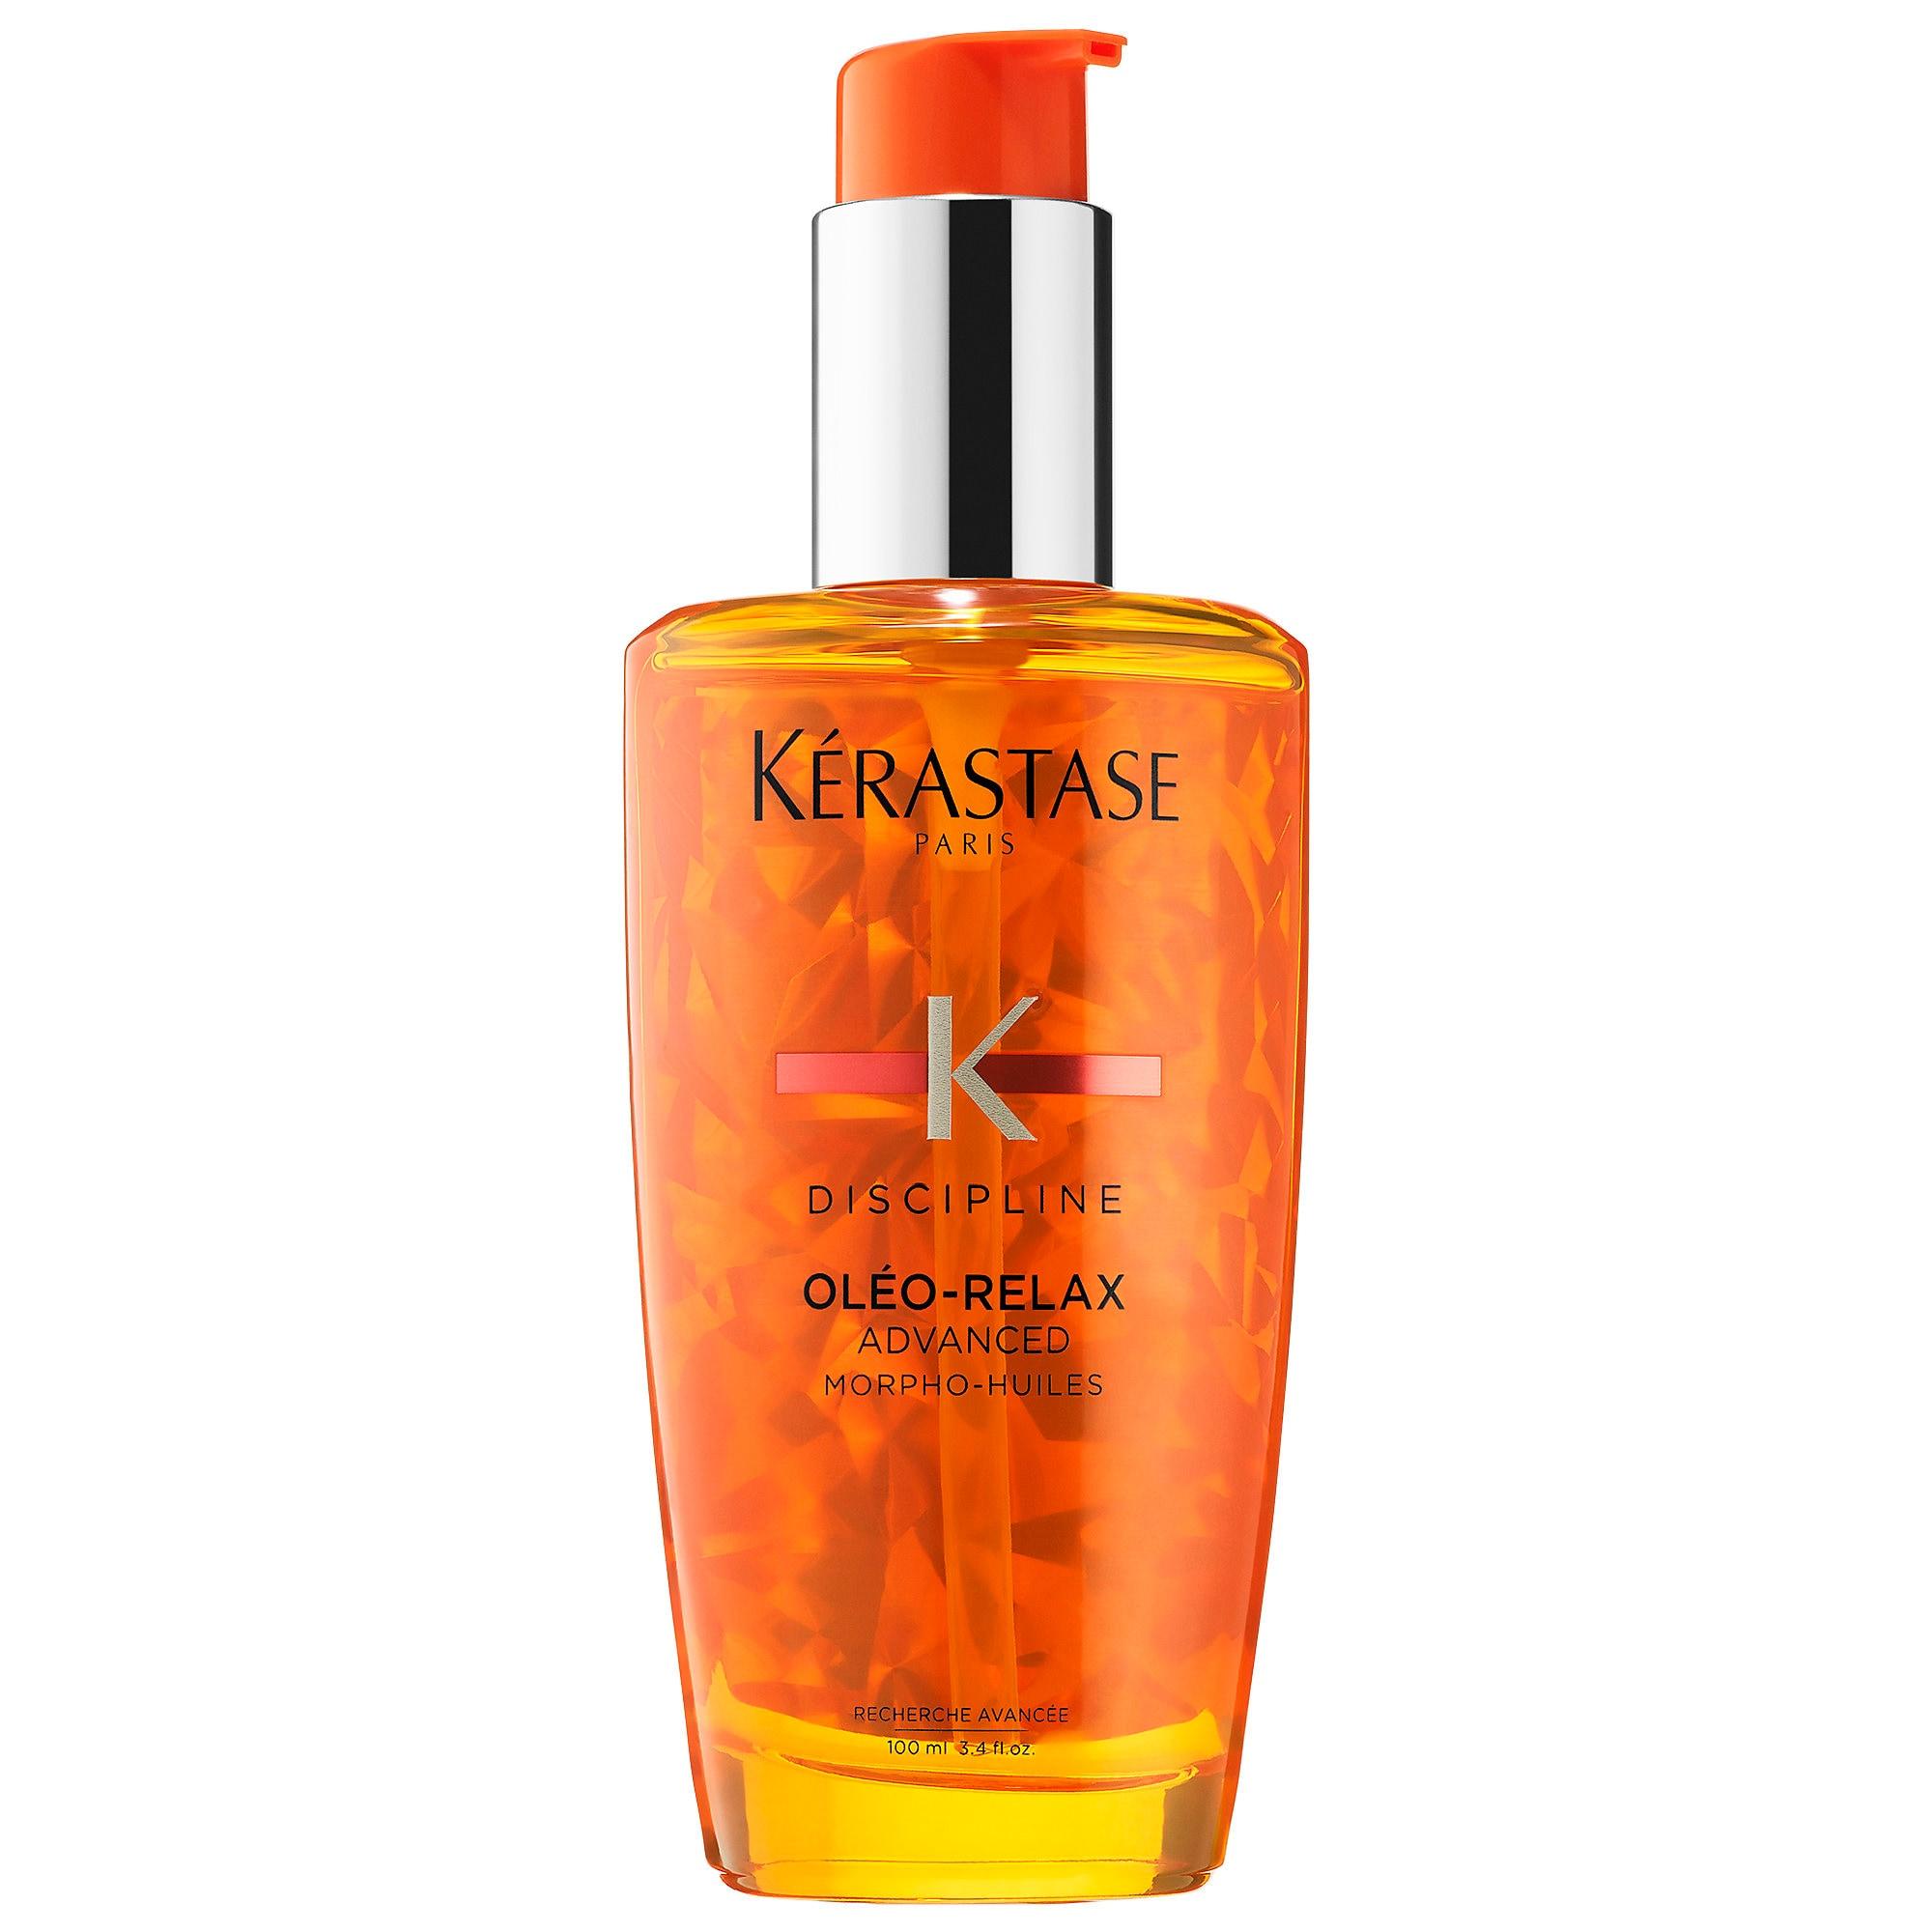 Kérastase Sérum Oléo-Relax. Hair Serum and How to Use Hair Serum - Shop Journey